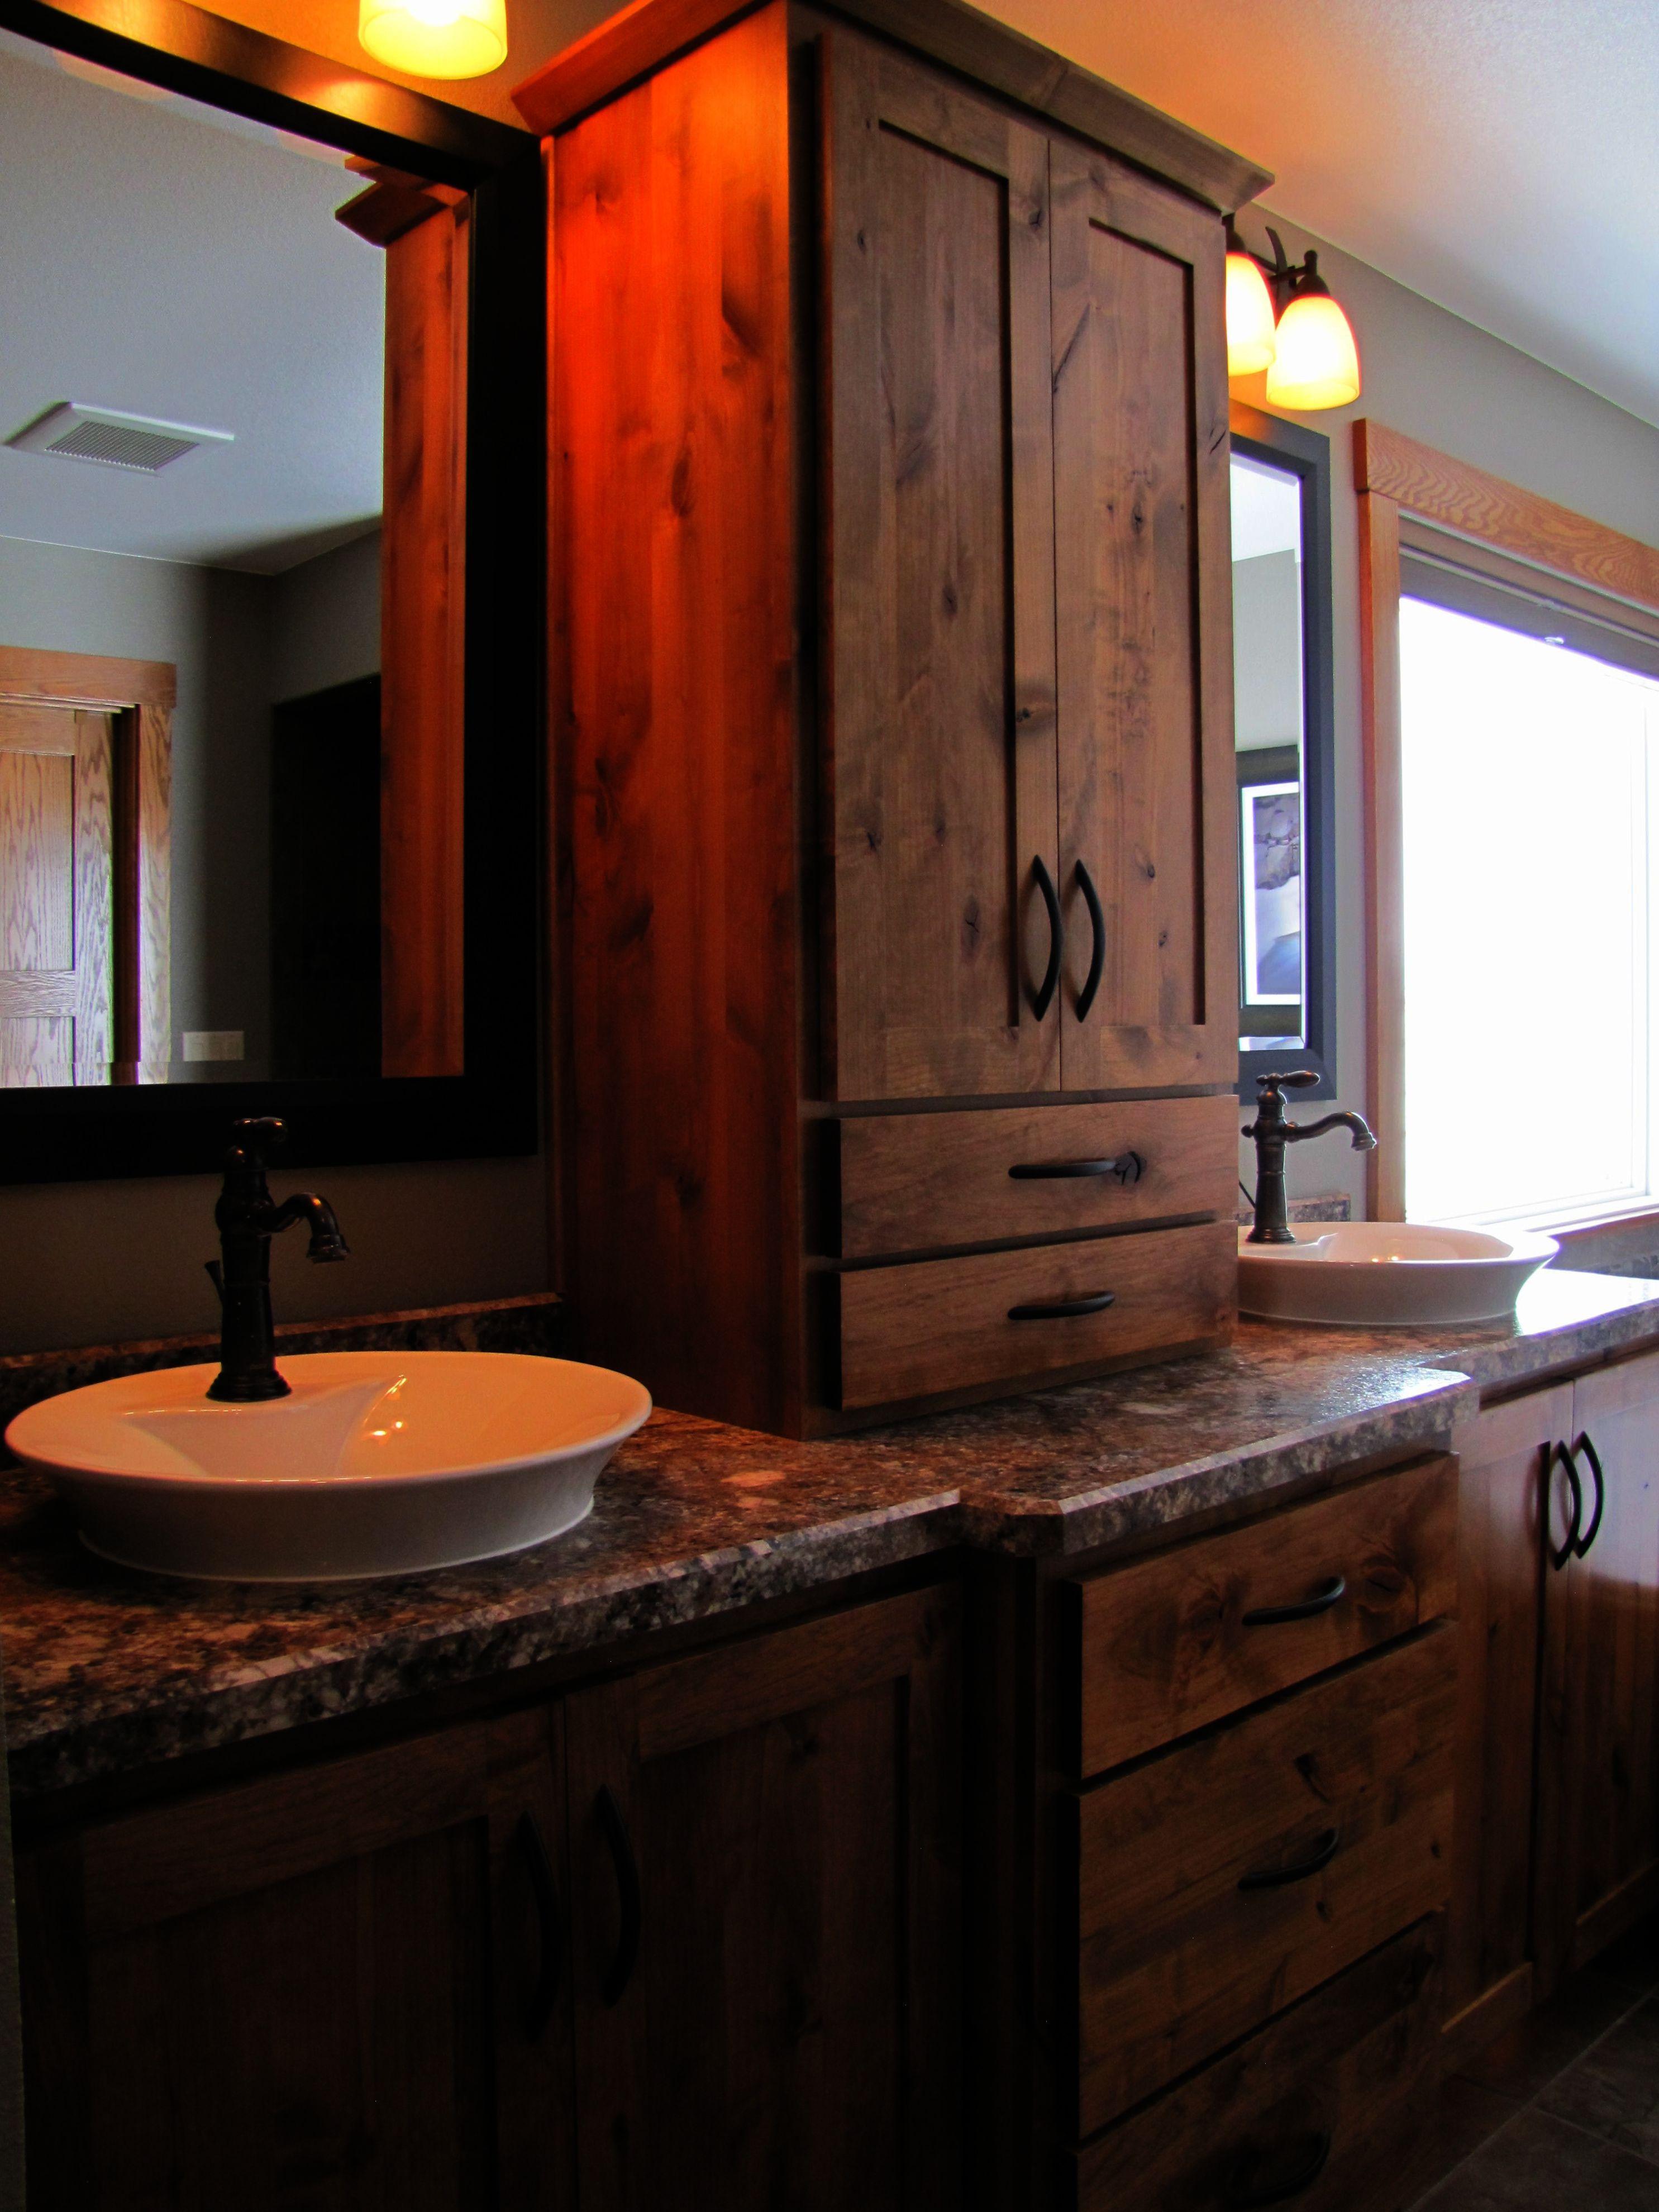 Rustic Bathroom Double Vanity Ideas - Rustic Alder Cabinetry Highlights